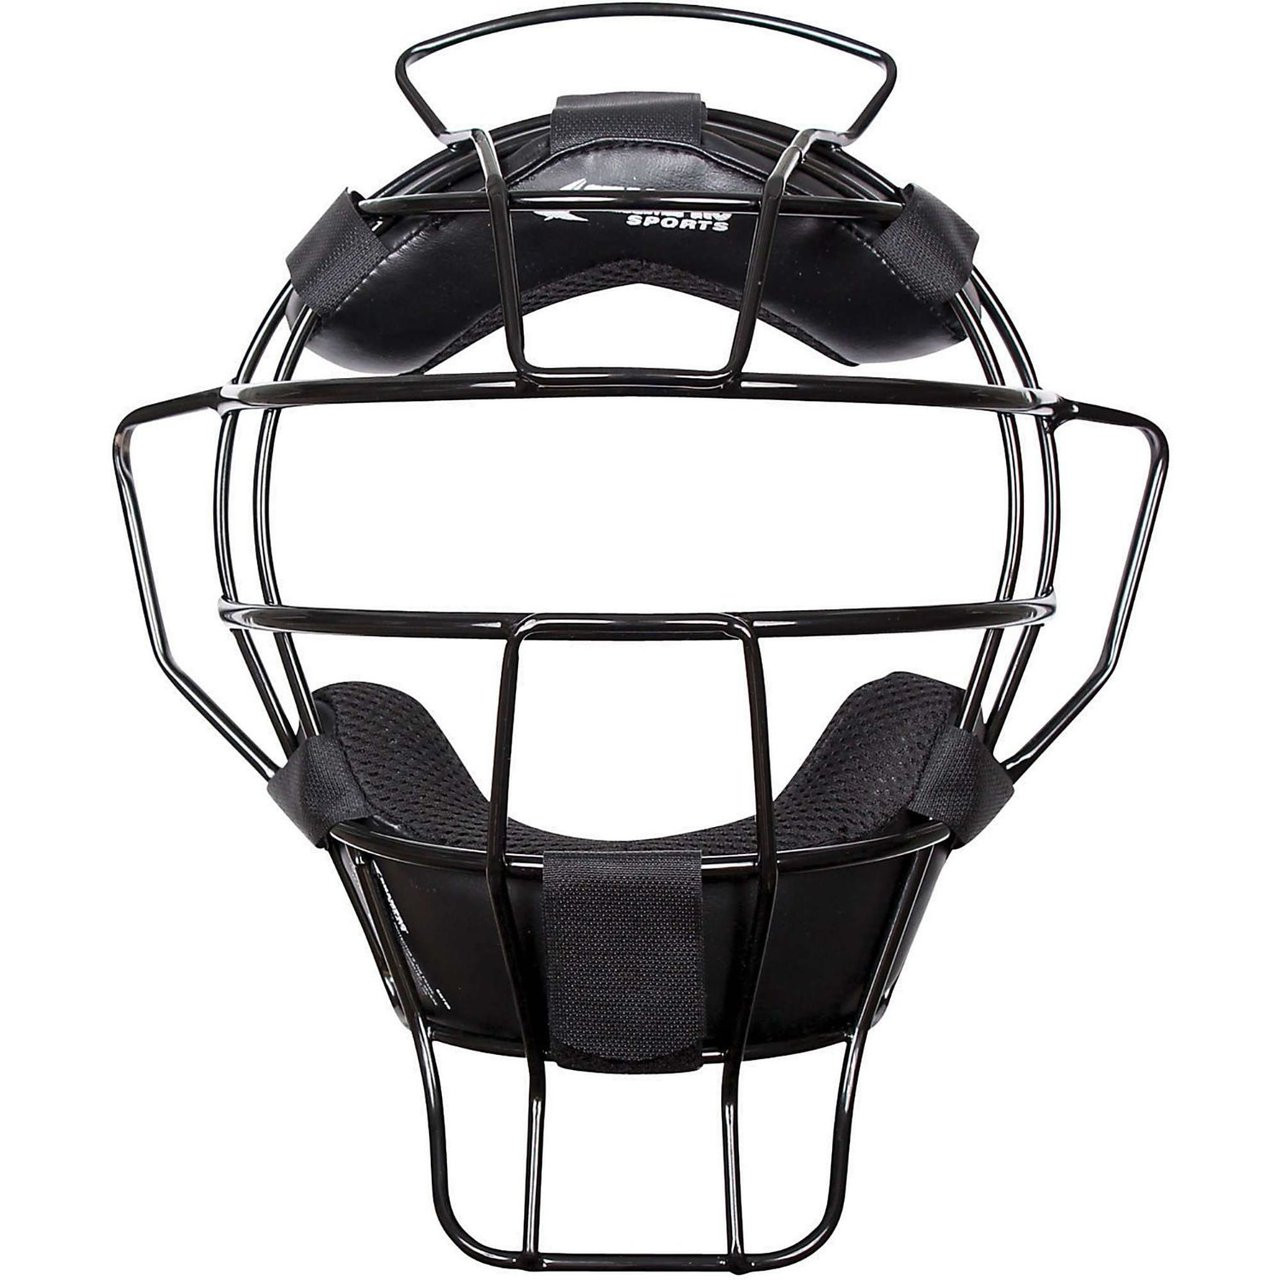 Champro Sports Lightweight Black Frame Umpire Mask